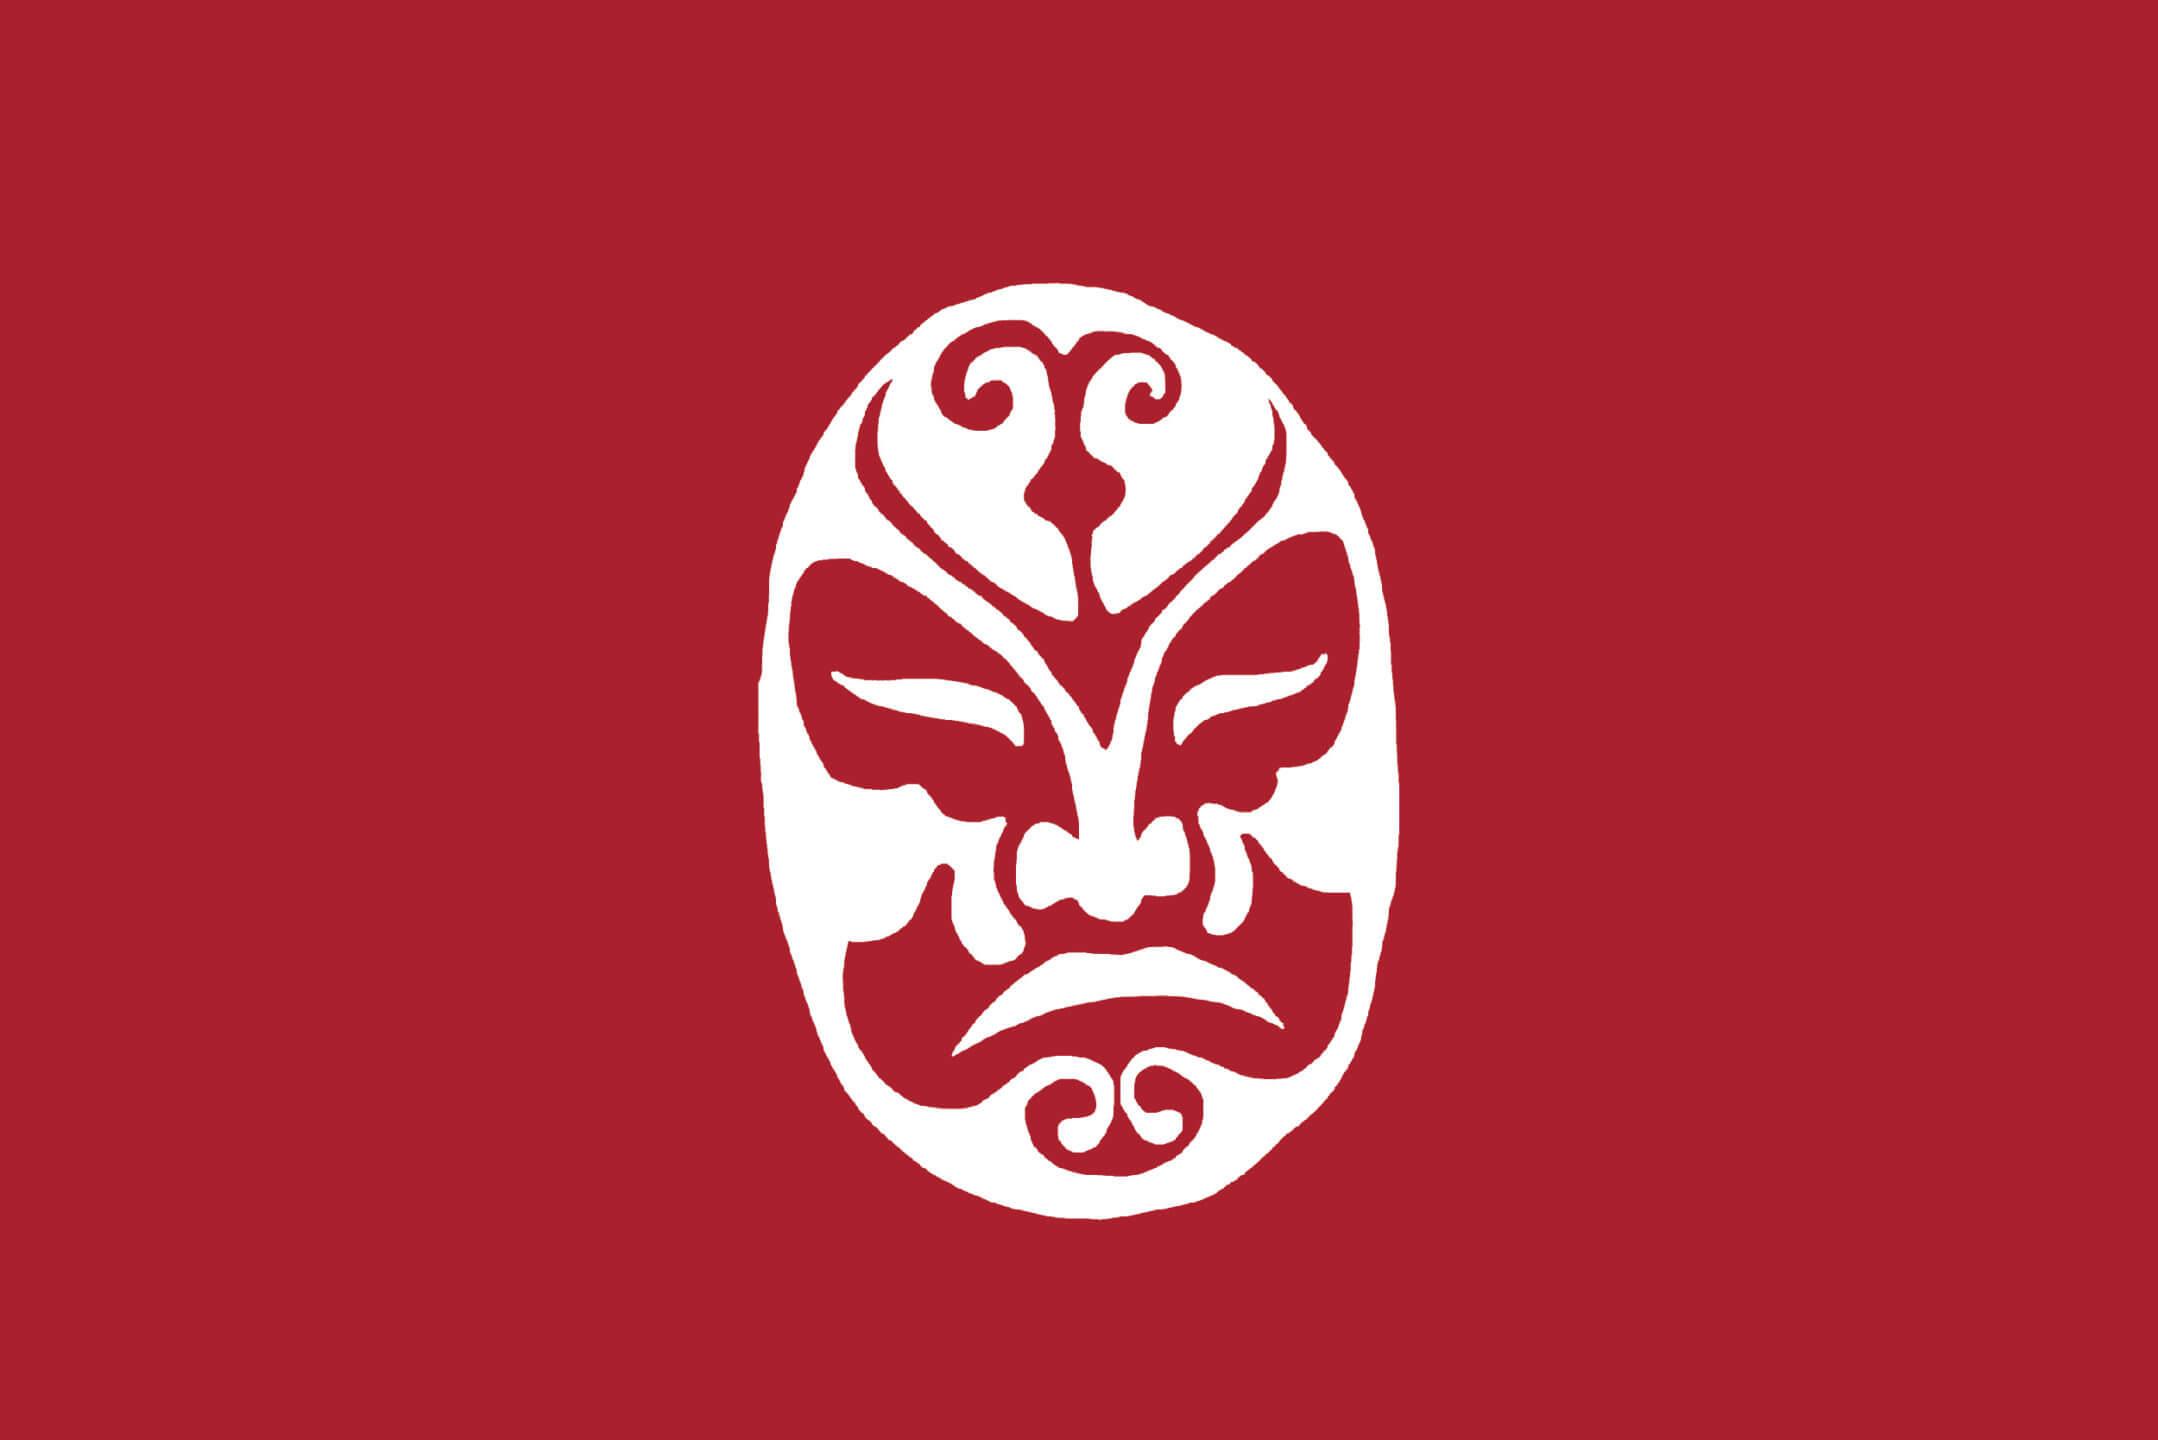 La Chinesca's luchador mask-inspired logo icon